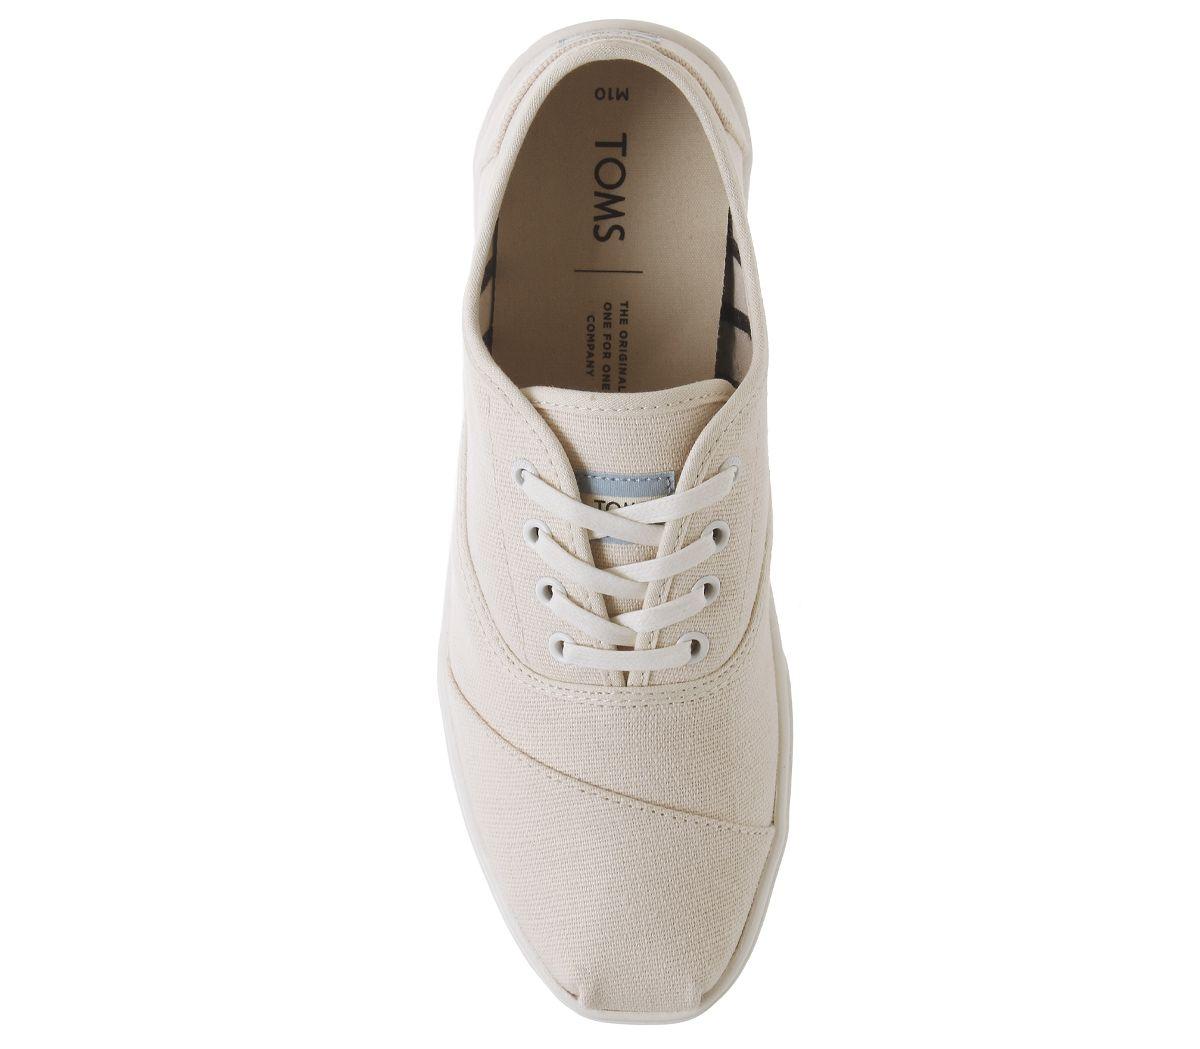 Da-Uomo-Toms-Cordones-Scarpe-da-ginnastica-Naturale-Scarpe-Casual miniatura 5